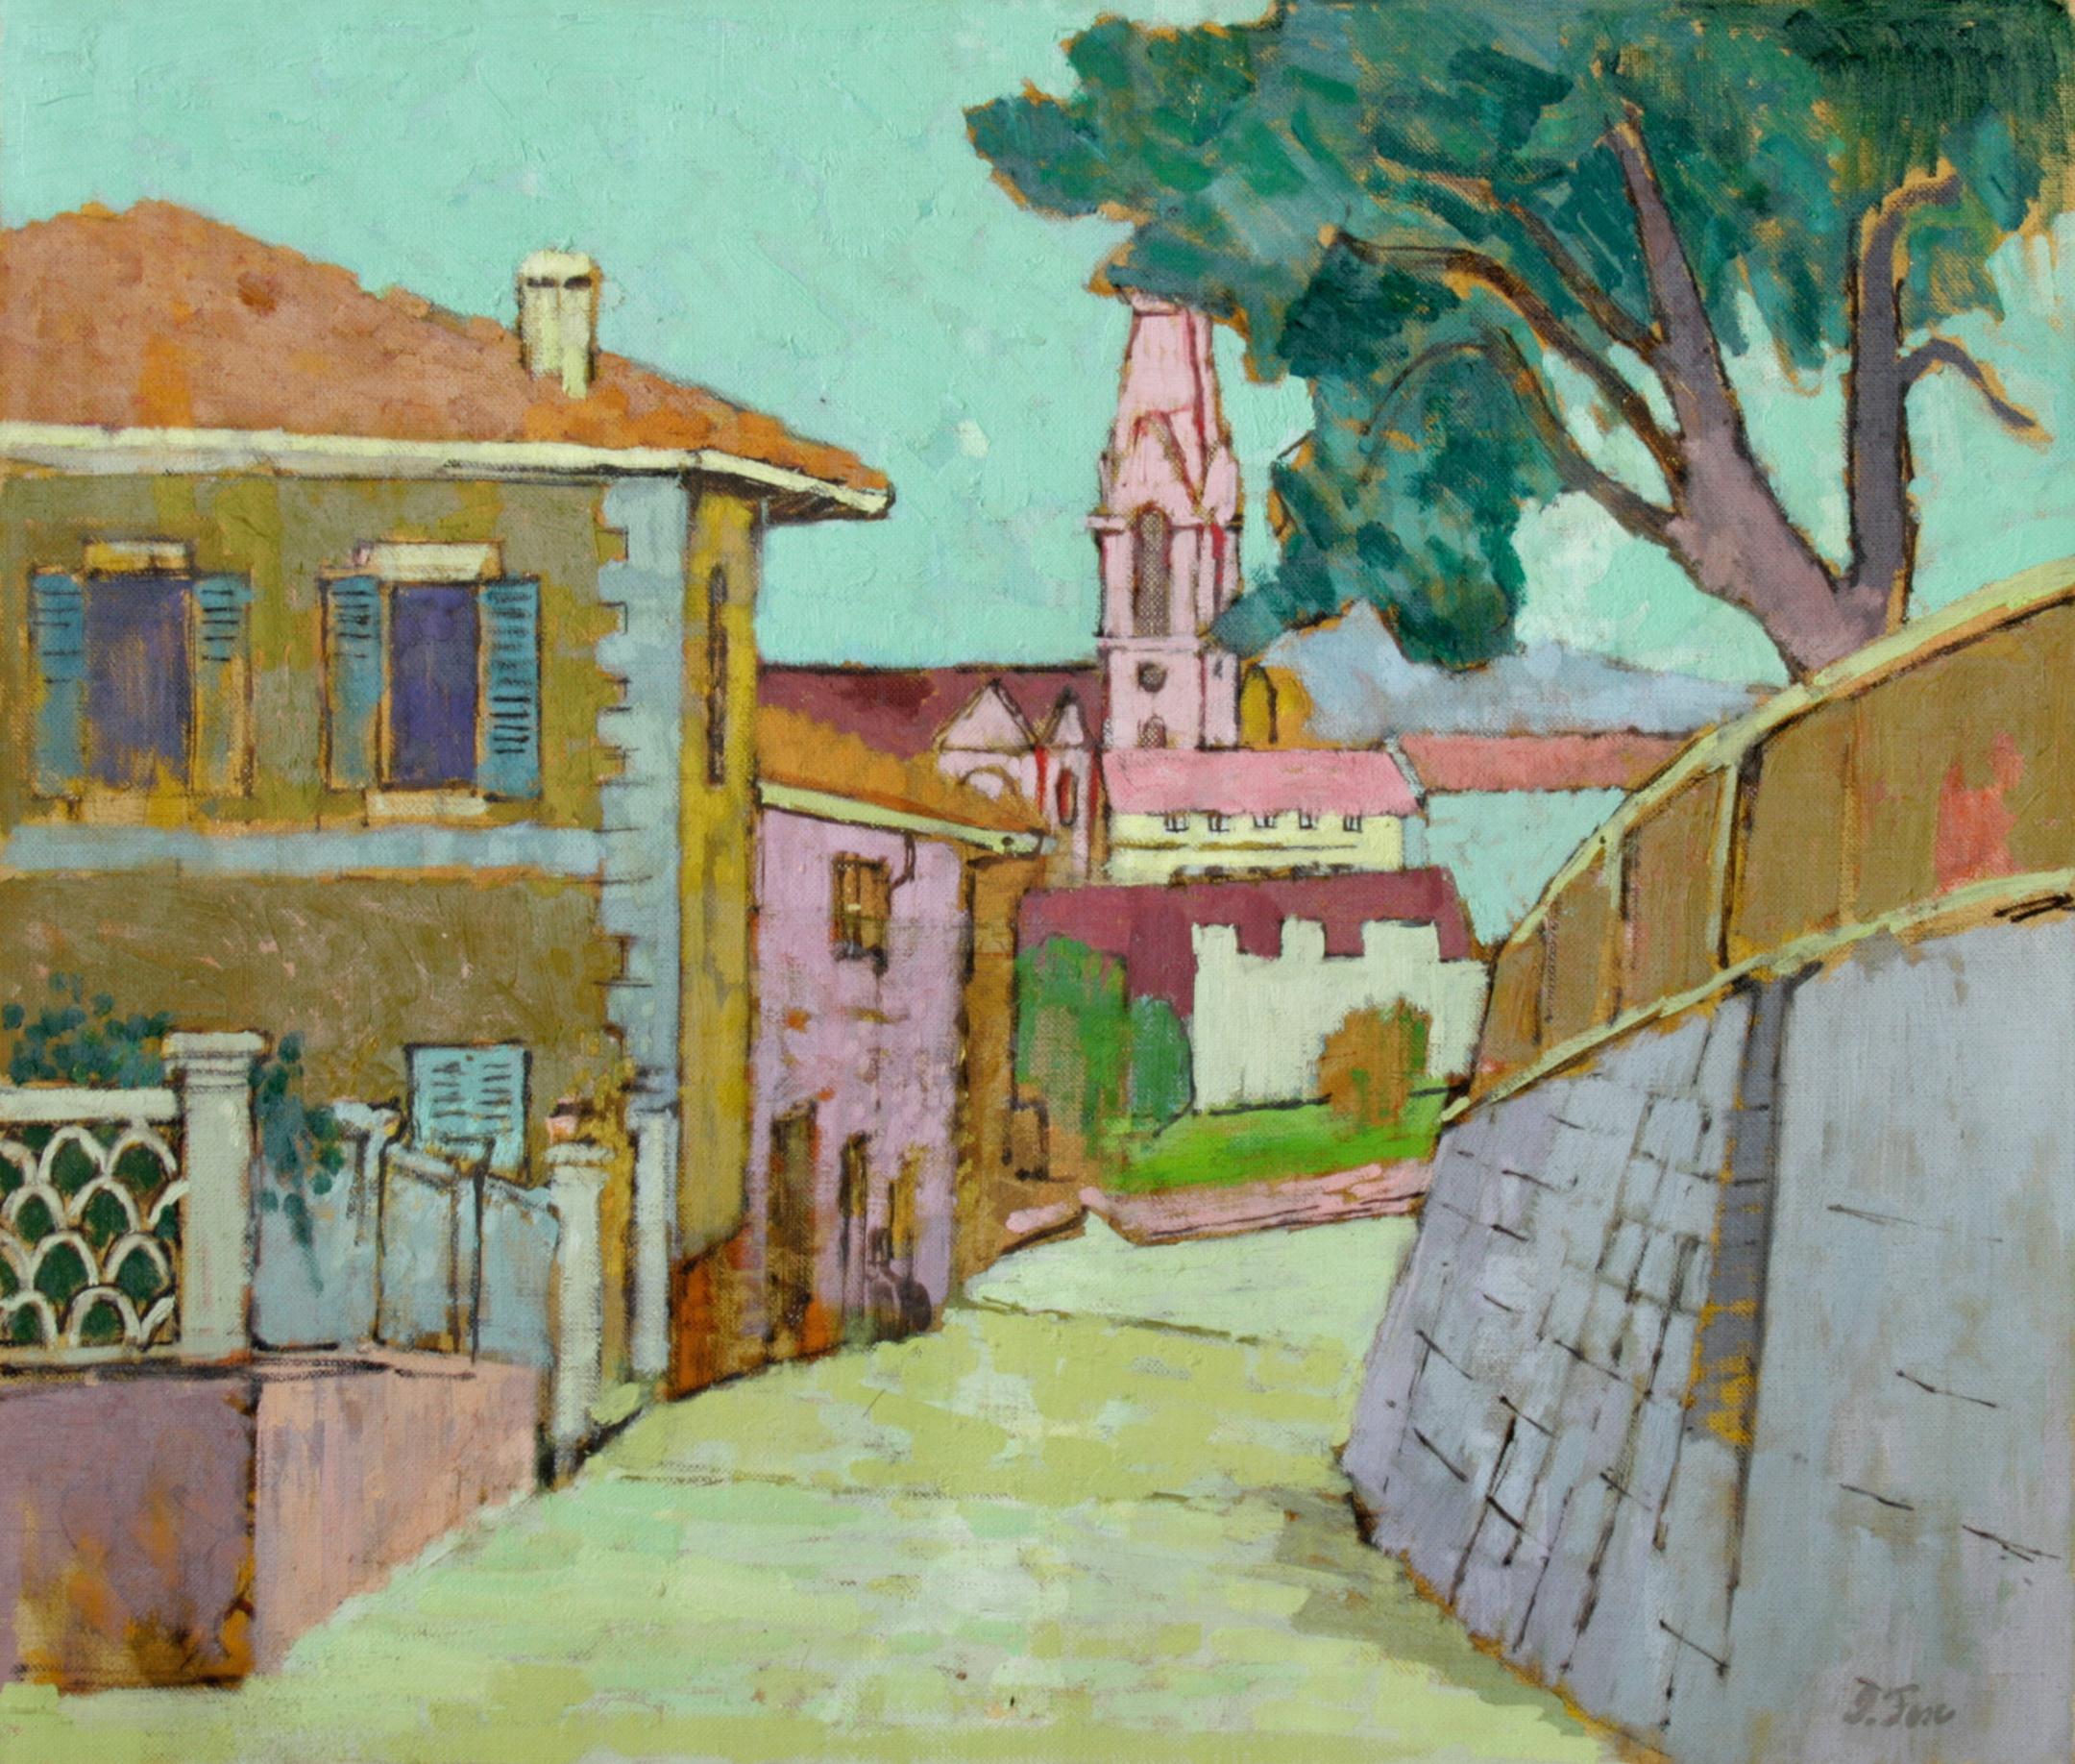 1956_Tuscany_oil_on_linen_24x28in_PF312.jpg